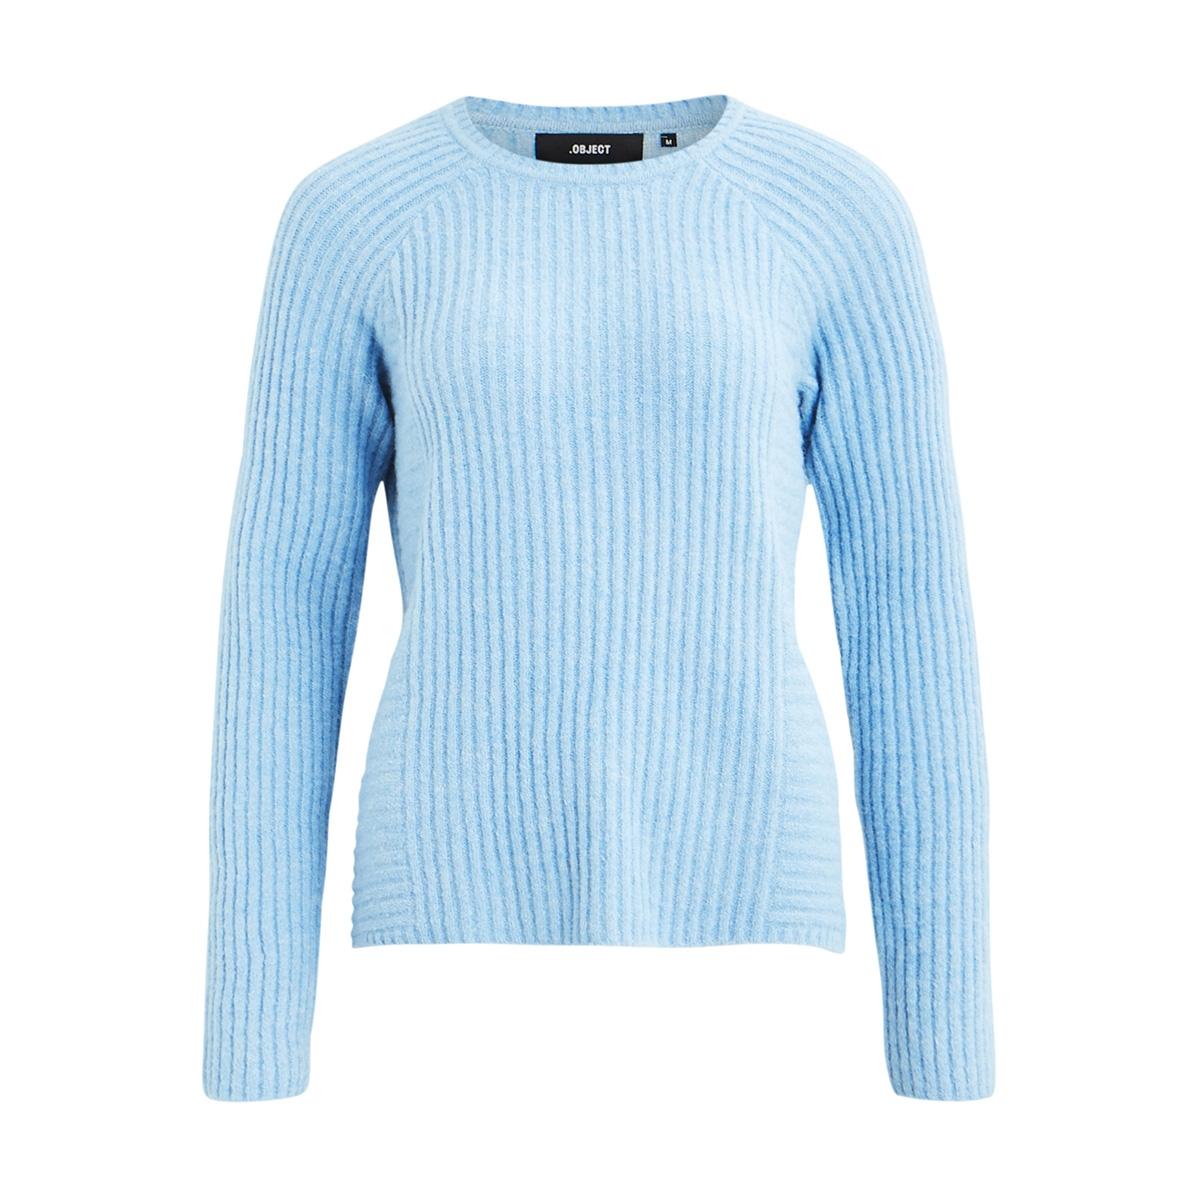 objnonsia rib l/s knit pullover sea 23027812 object trui heritage blue